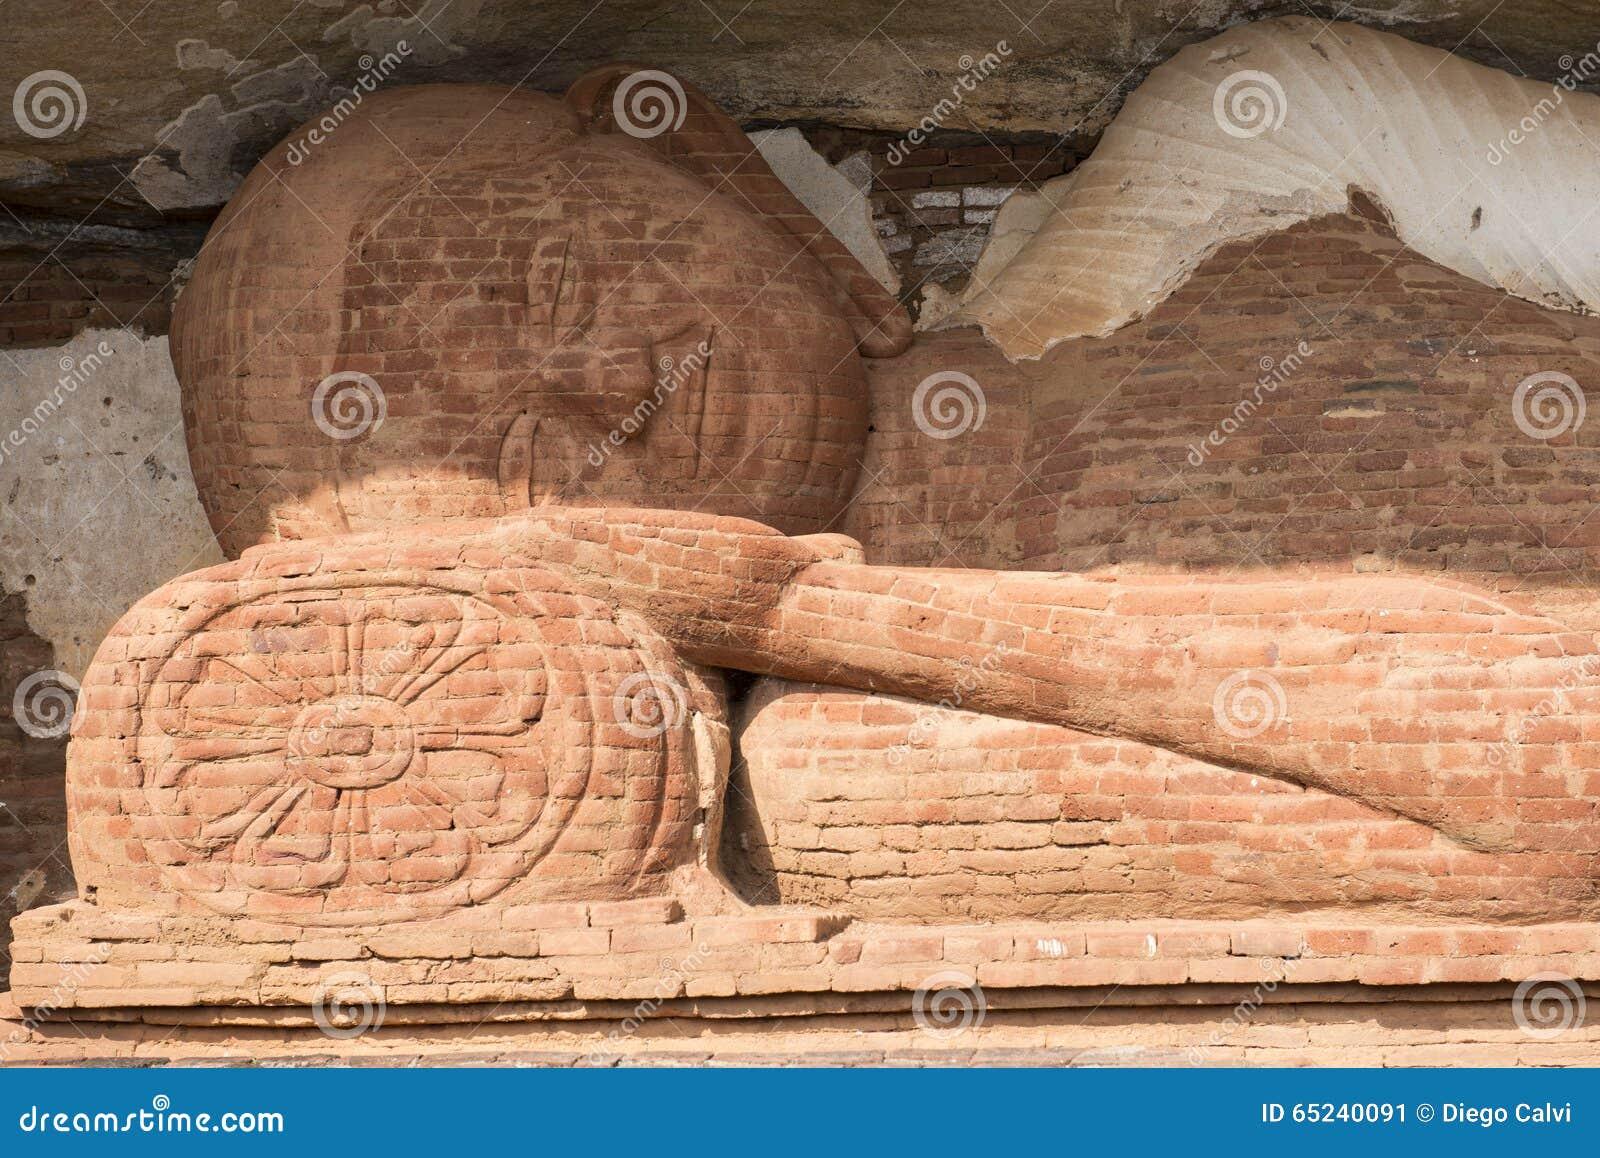 Detail of Buddha lying. Sigiriya, Sri Lanka